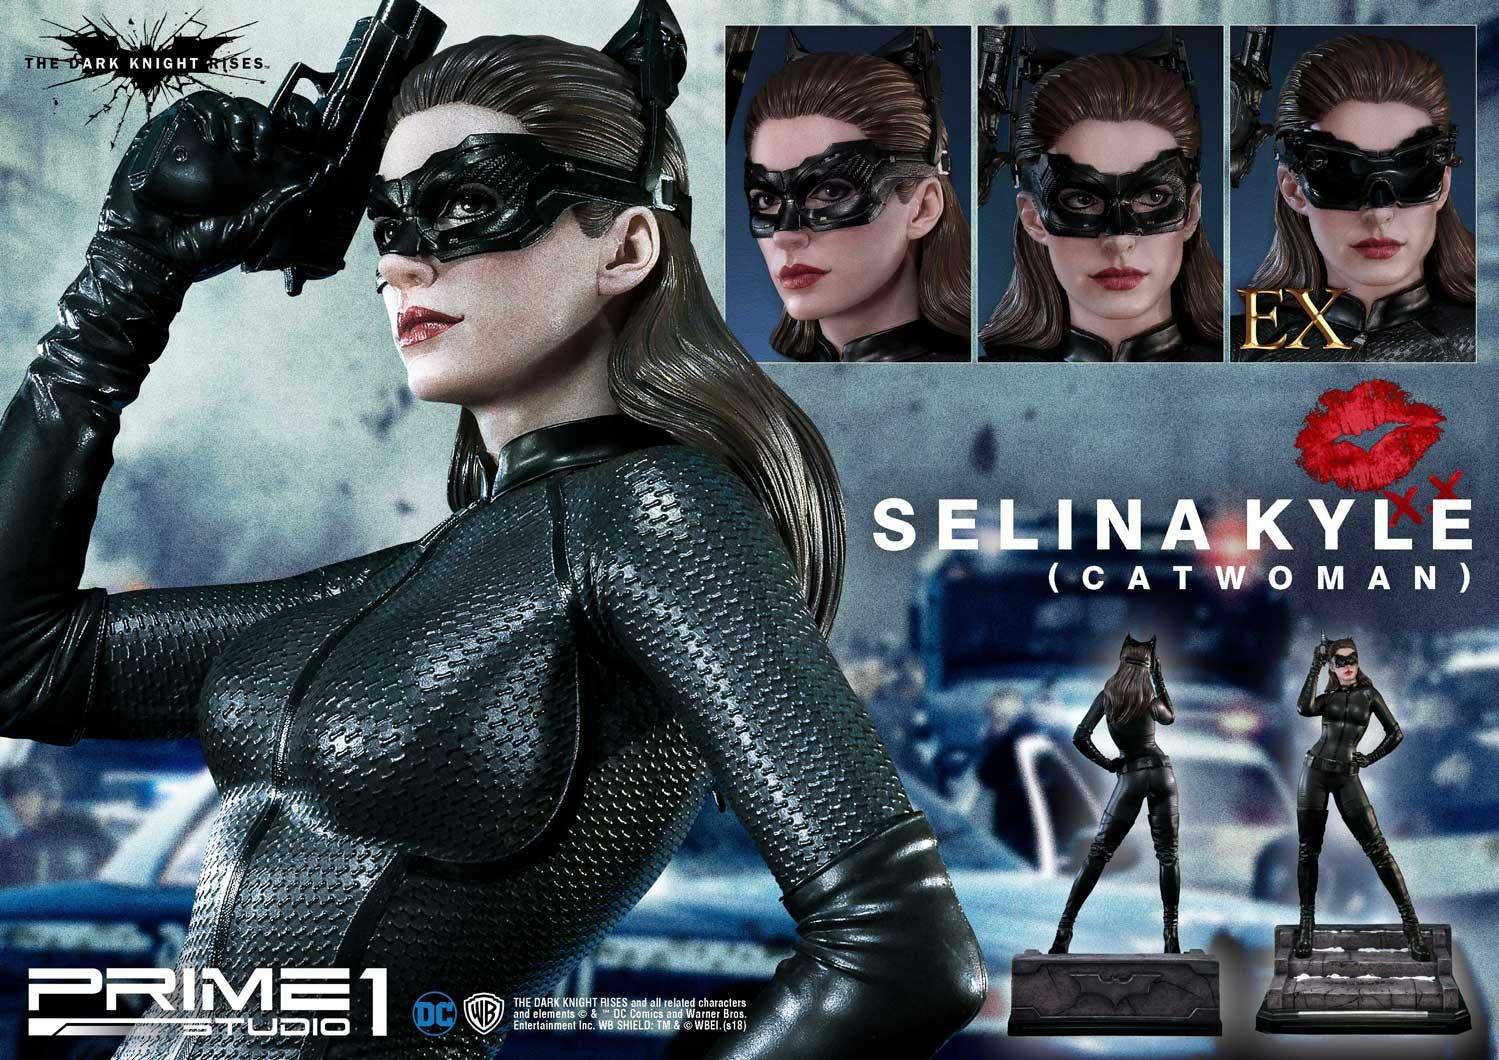 Catwoman (Selina Kyle) : Batman The Dark Knigh Rises (Prime 1 Studio) 0SHojRX2_o